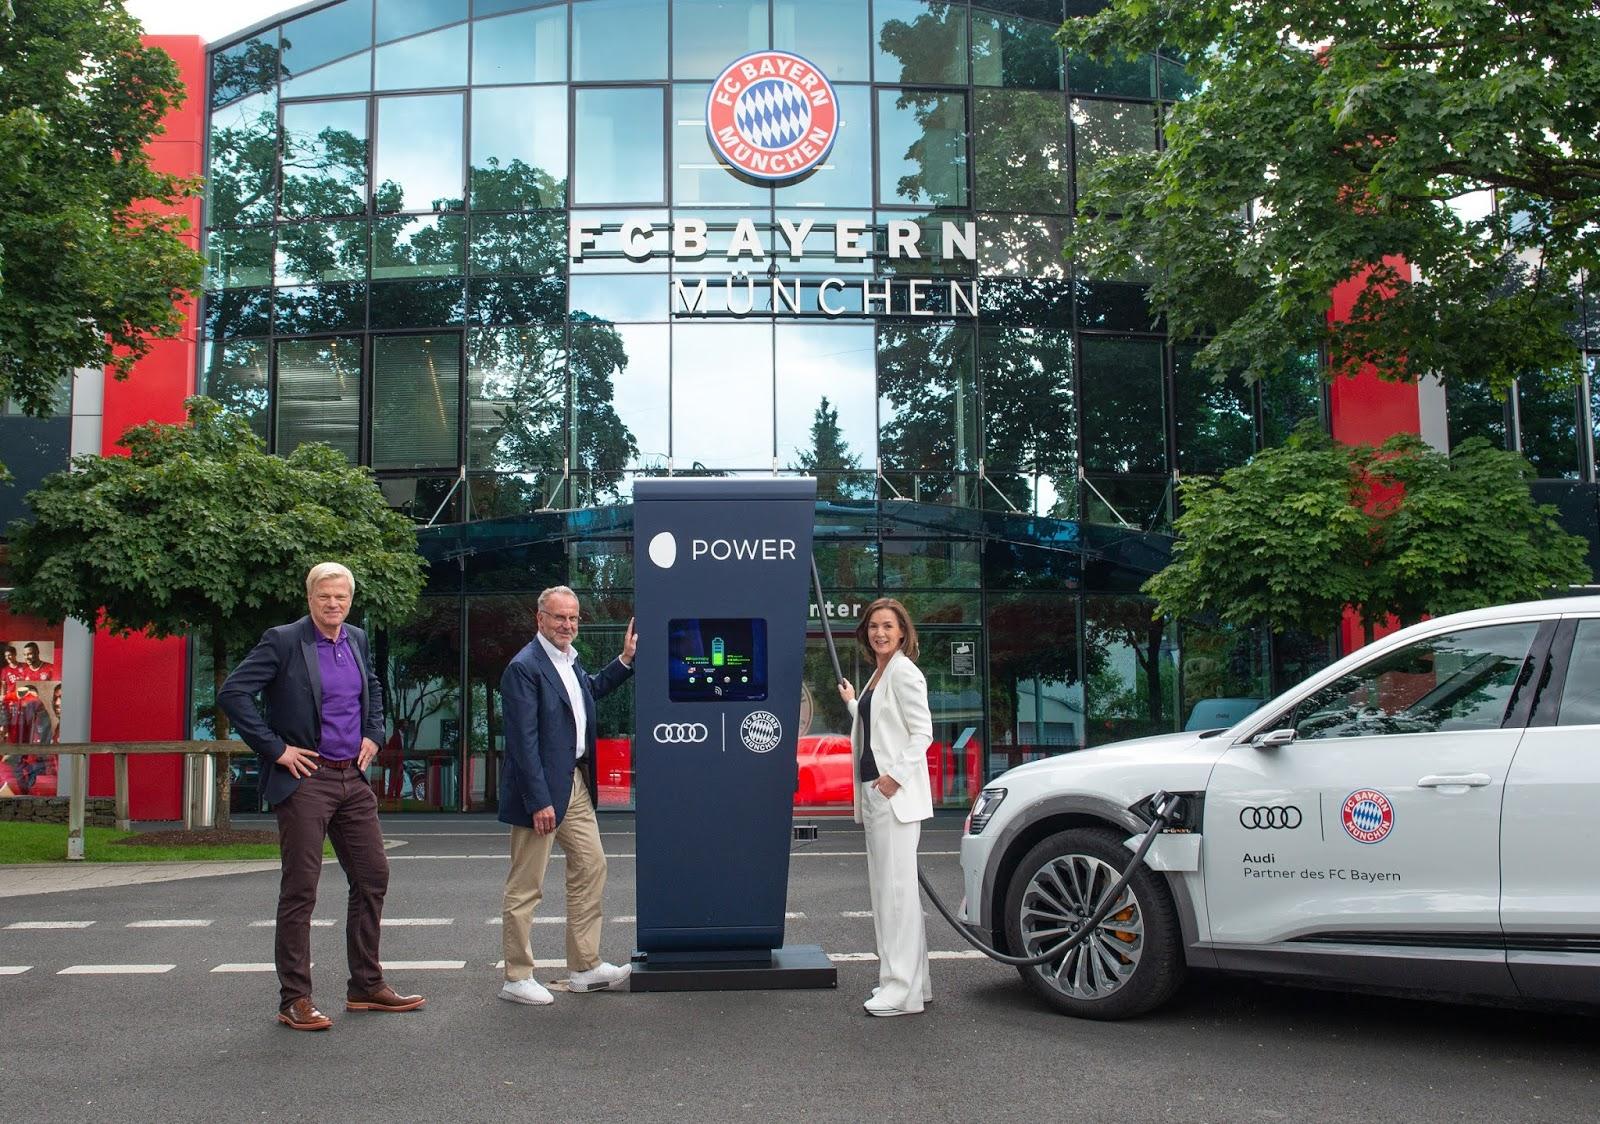 AUDI2B25262BFC2BBAYERN2BMUENCHEN CHARGERS2B252825CE2591 25CE25942BKAHN252C2BRUMMENIGGE252C2BWORTMANN2529 Audi Ε-tron & FC Bayern: φορτίζουν για την αειφορία